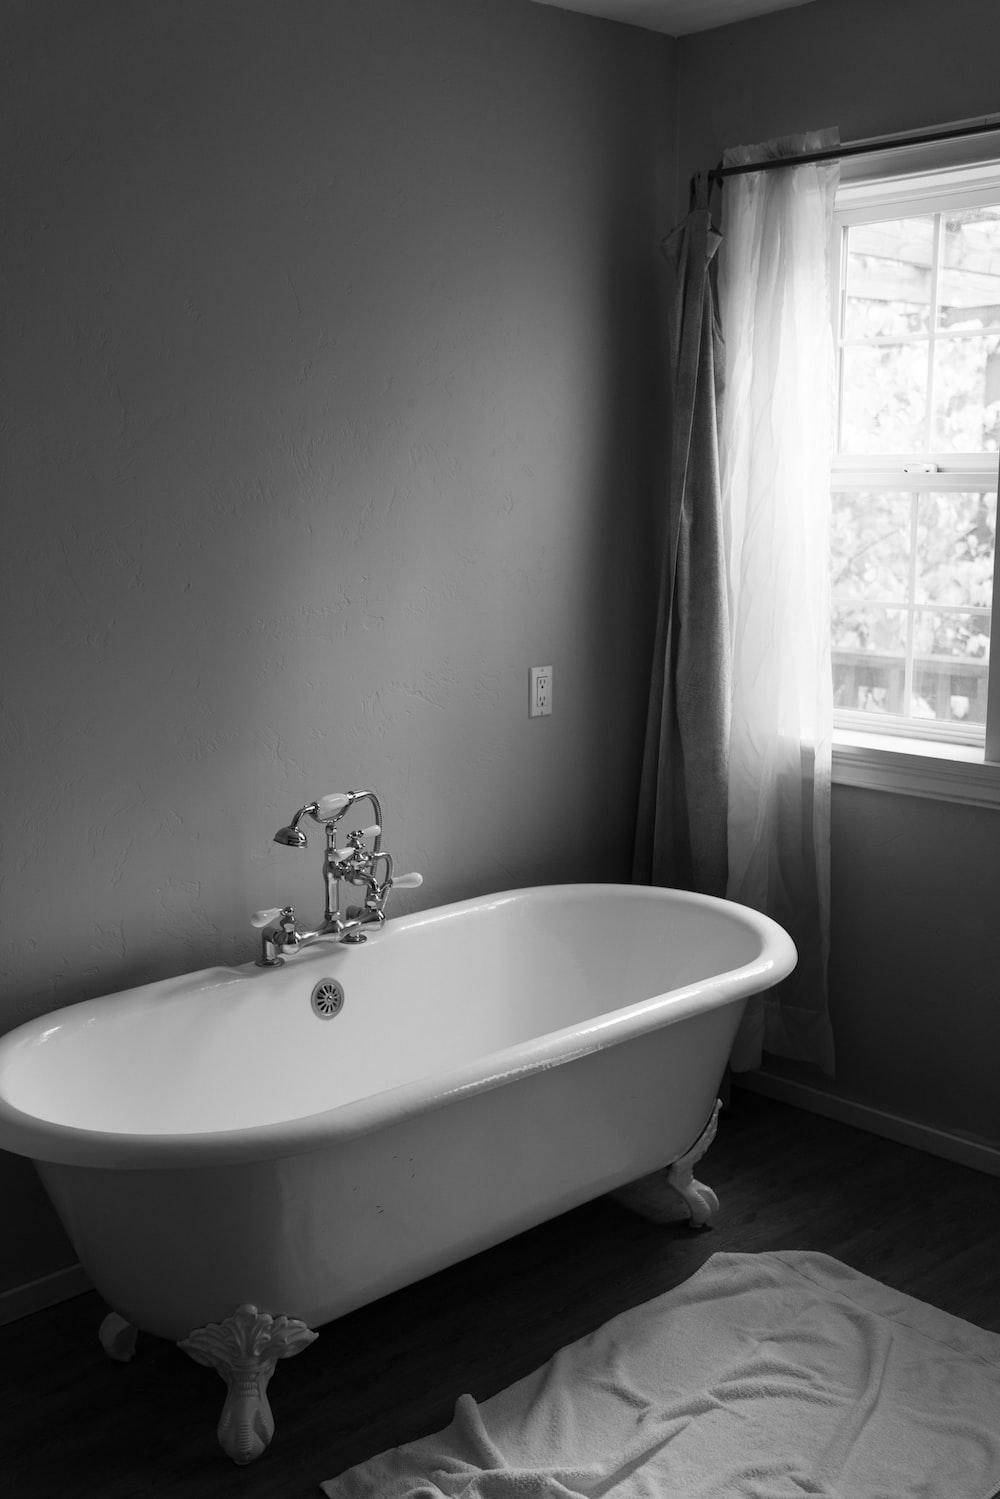 white ceramic bath tub inside room